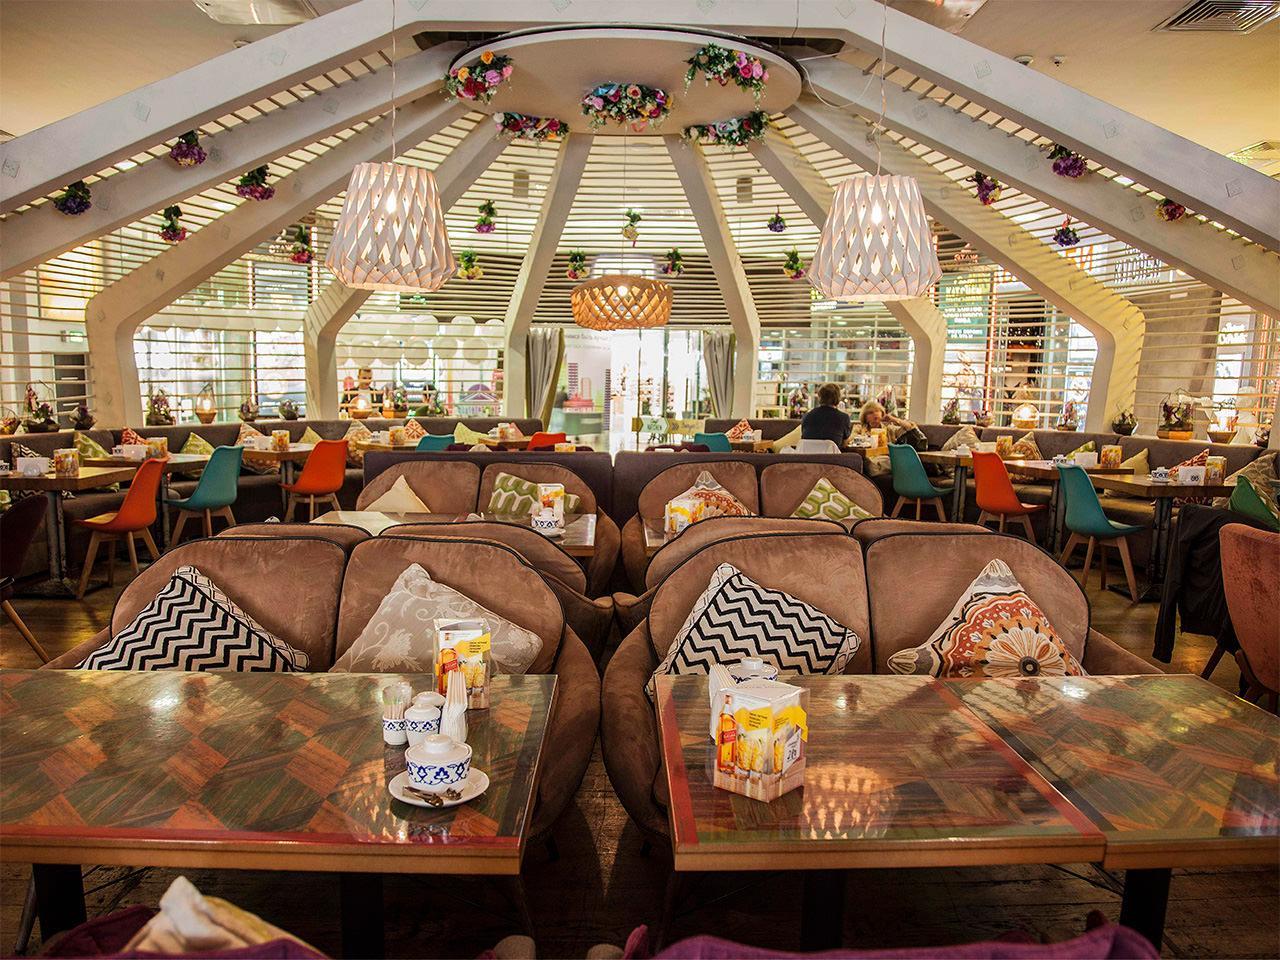 Ресторан Чайхона №1 в ТЦ Европейский возобновил свою работу